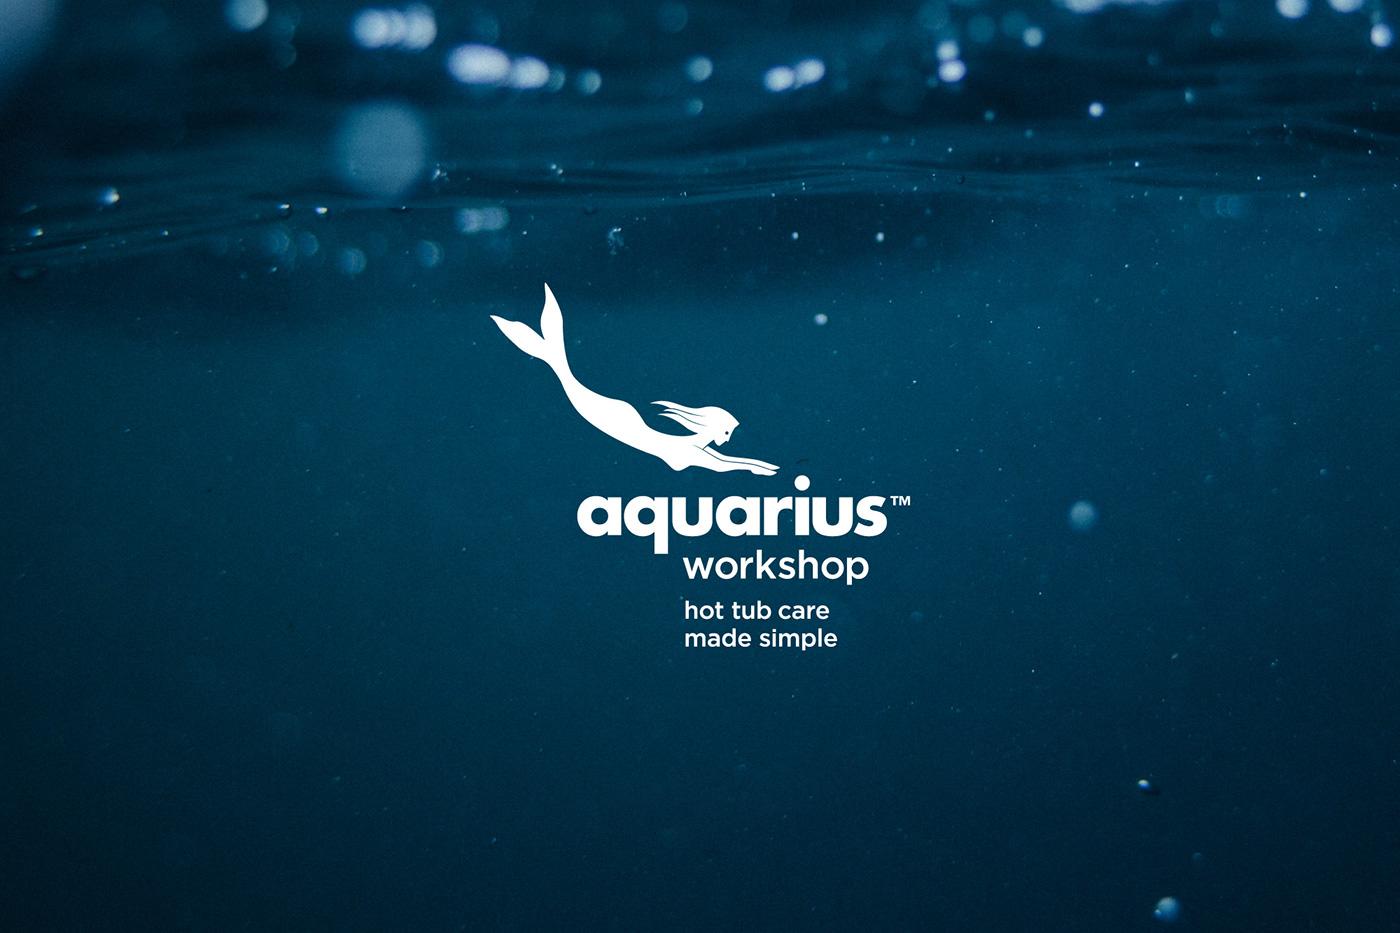 Aquarius Workshop on Behance